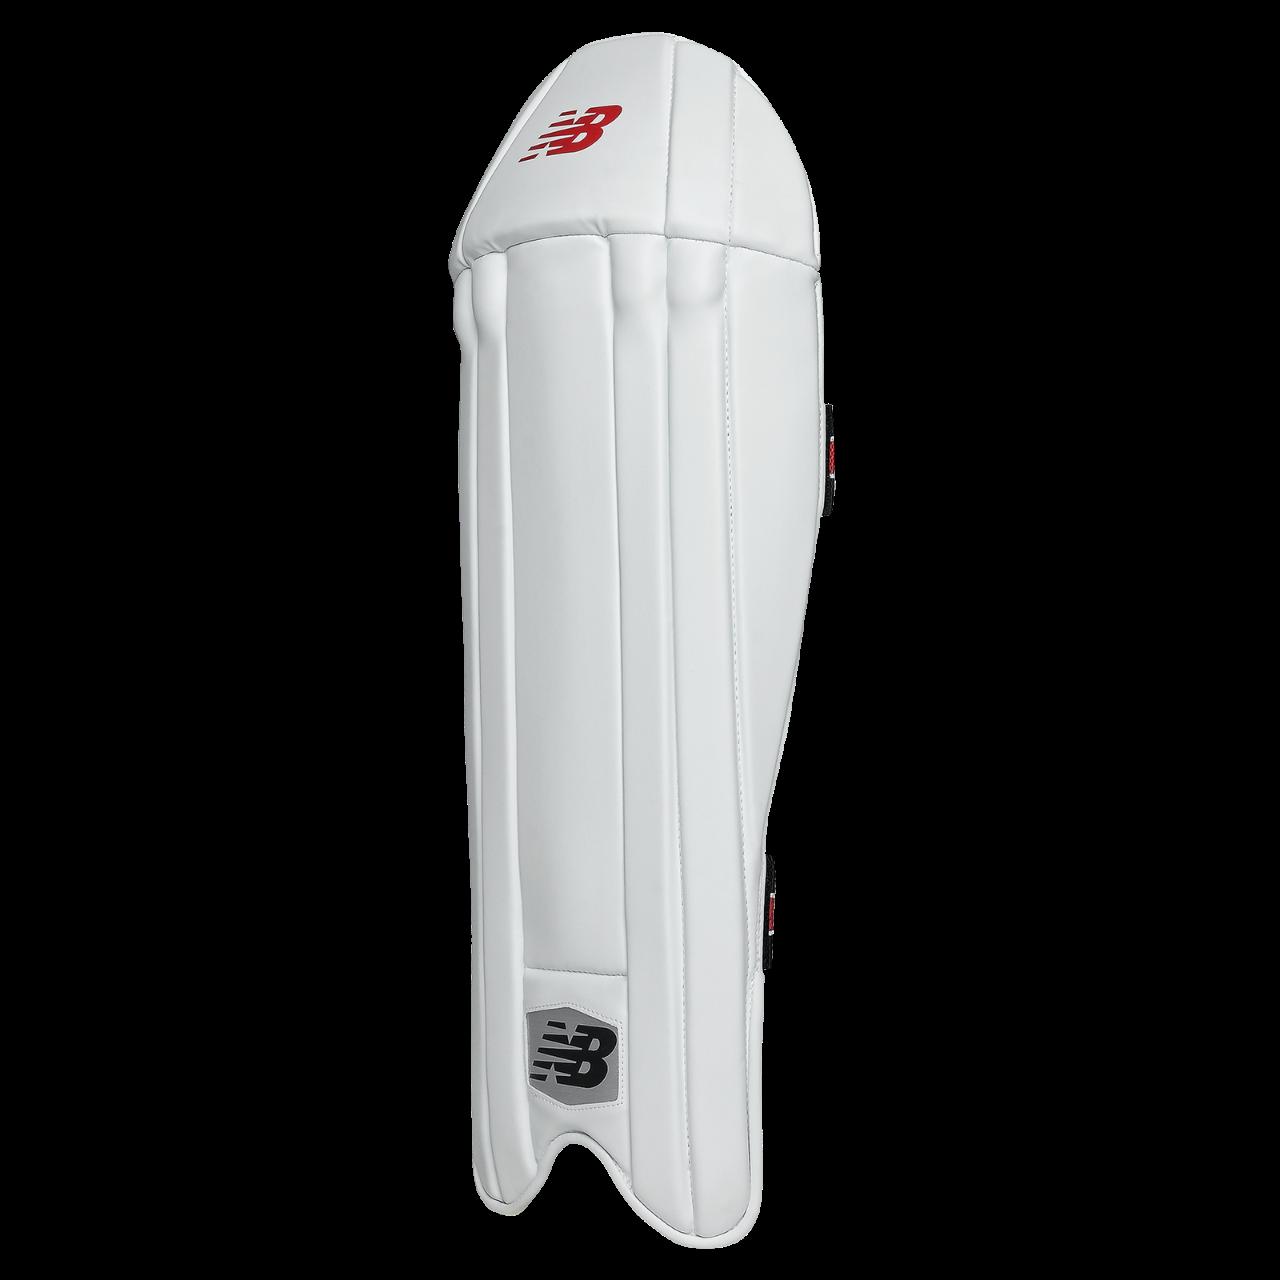 2021 New Balance TC 860 Wicket Keeping Pads